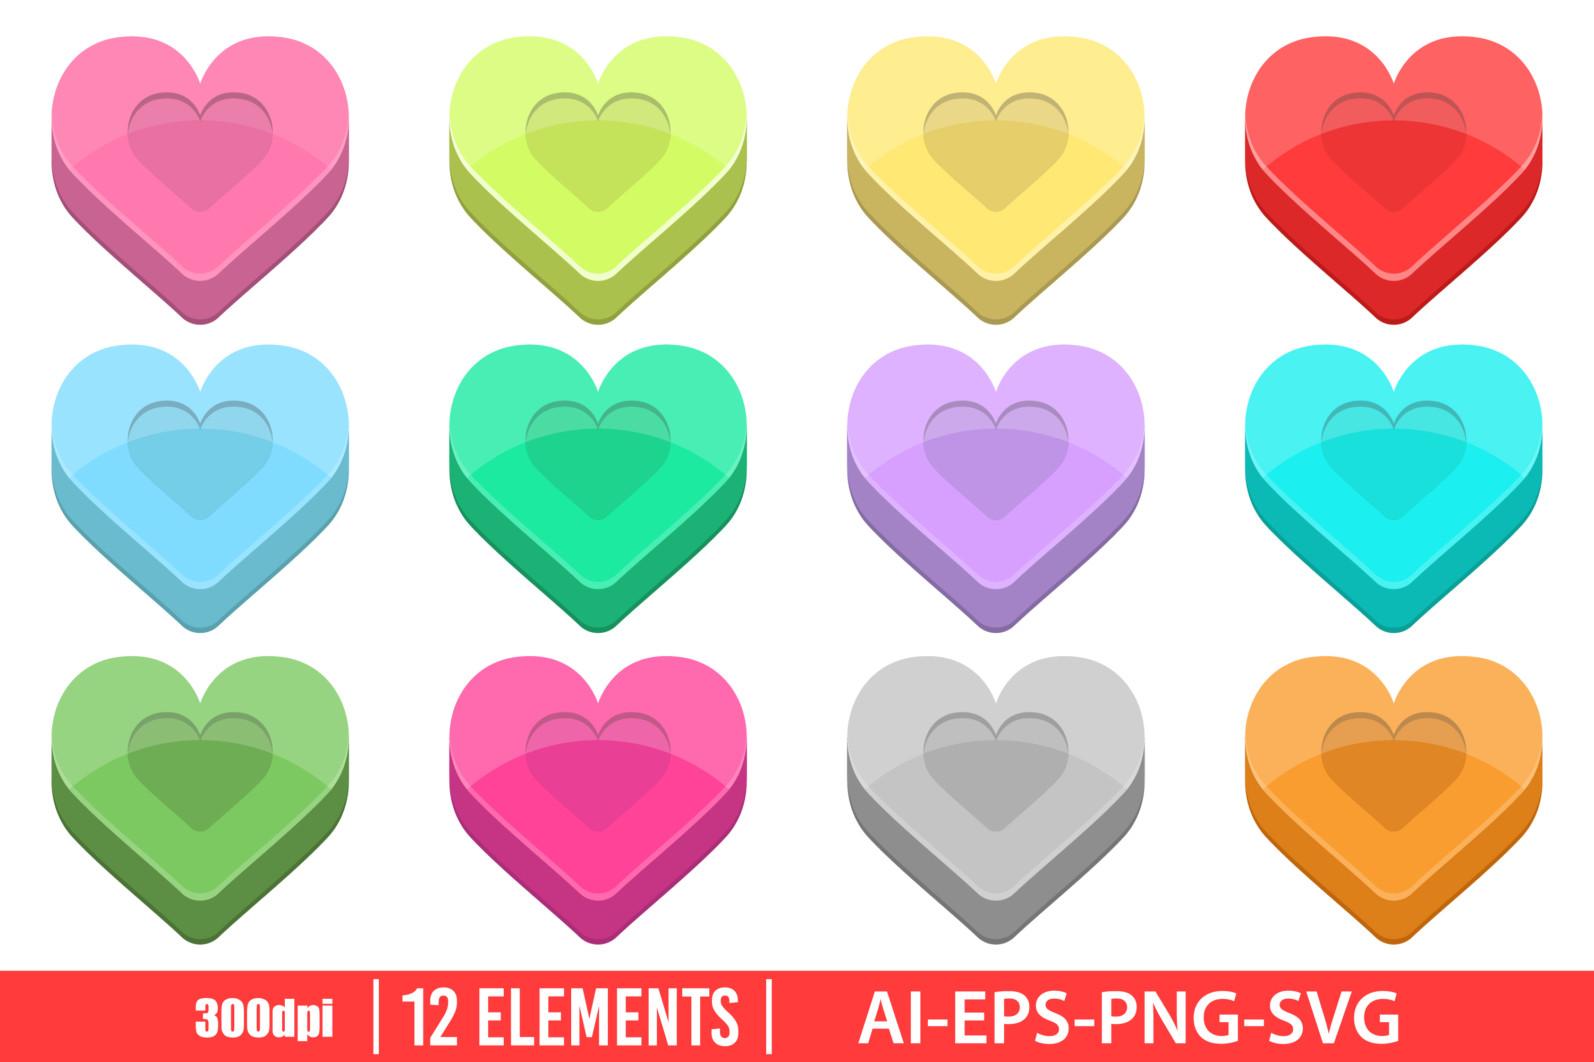 Heart shape clipart vector design illustration. Heart shape set. Vector Clipart Print - HEART SHAPE scaled -